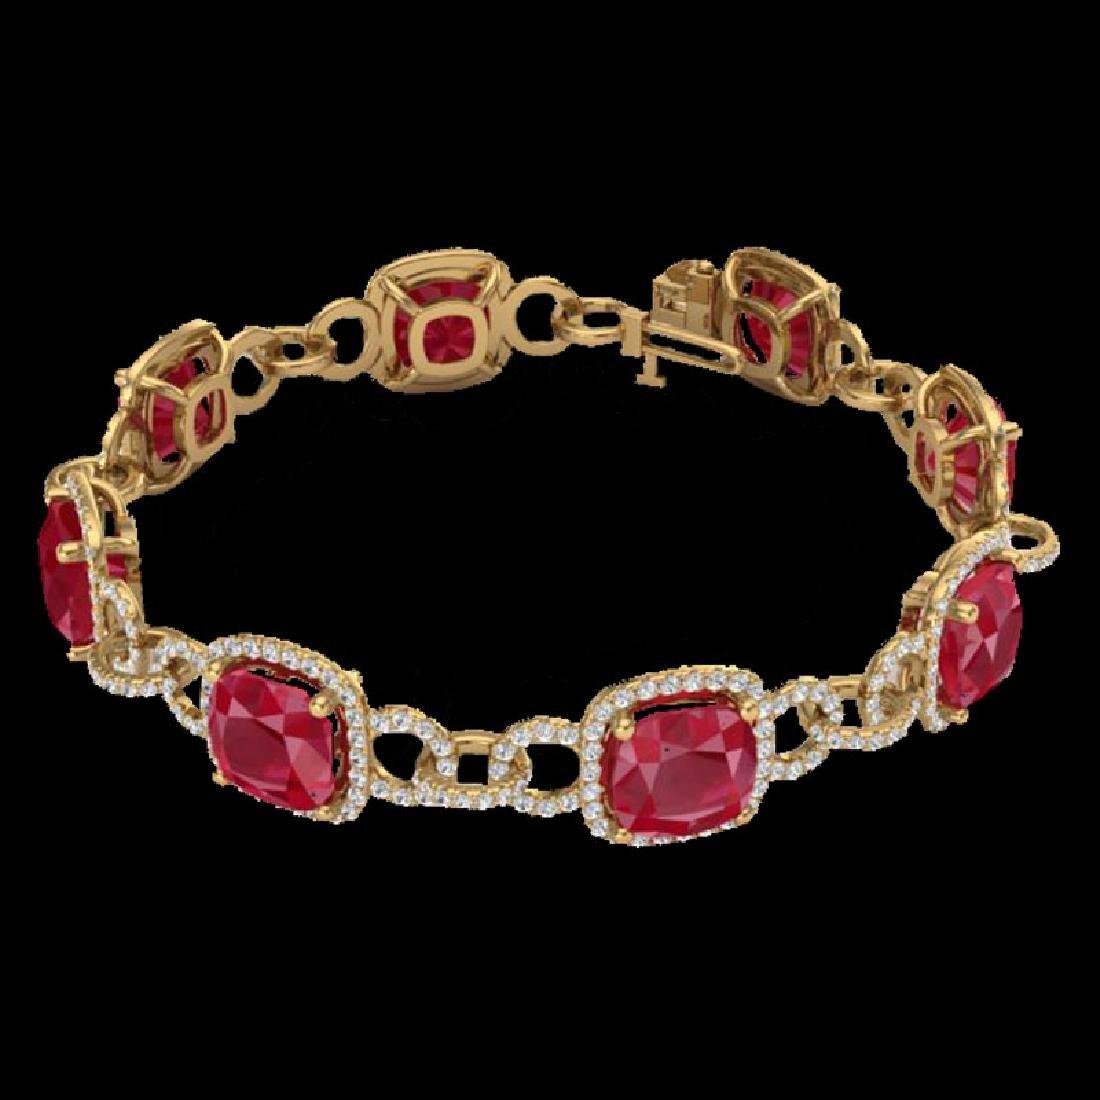 25 CTW Ruby & Micro VS/SI Diamond Bracelet 14K Yellow - 2